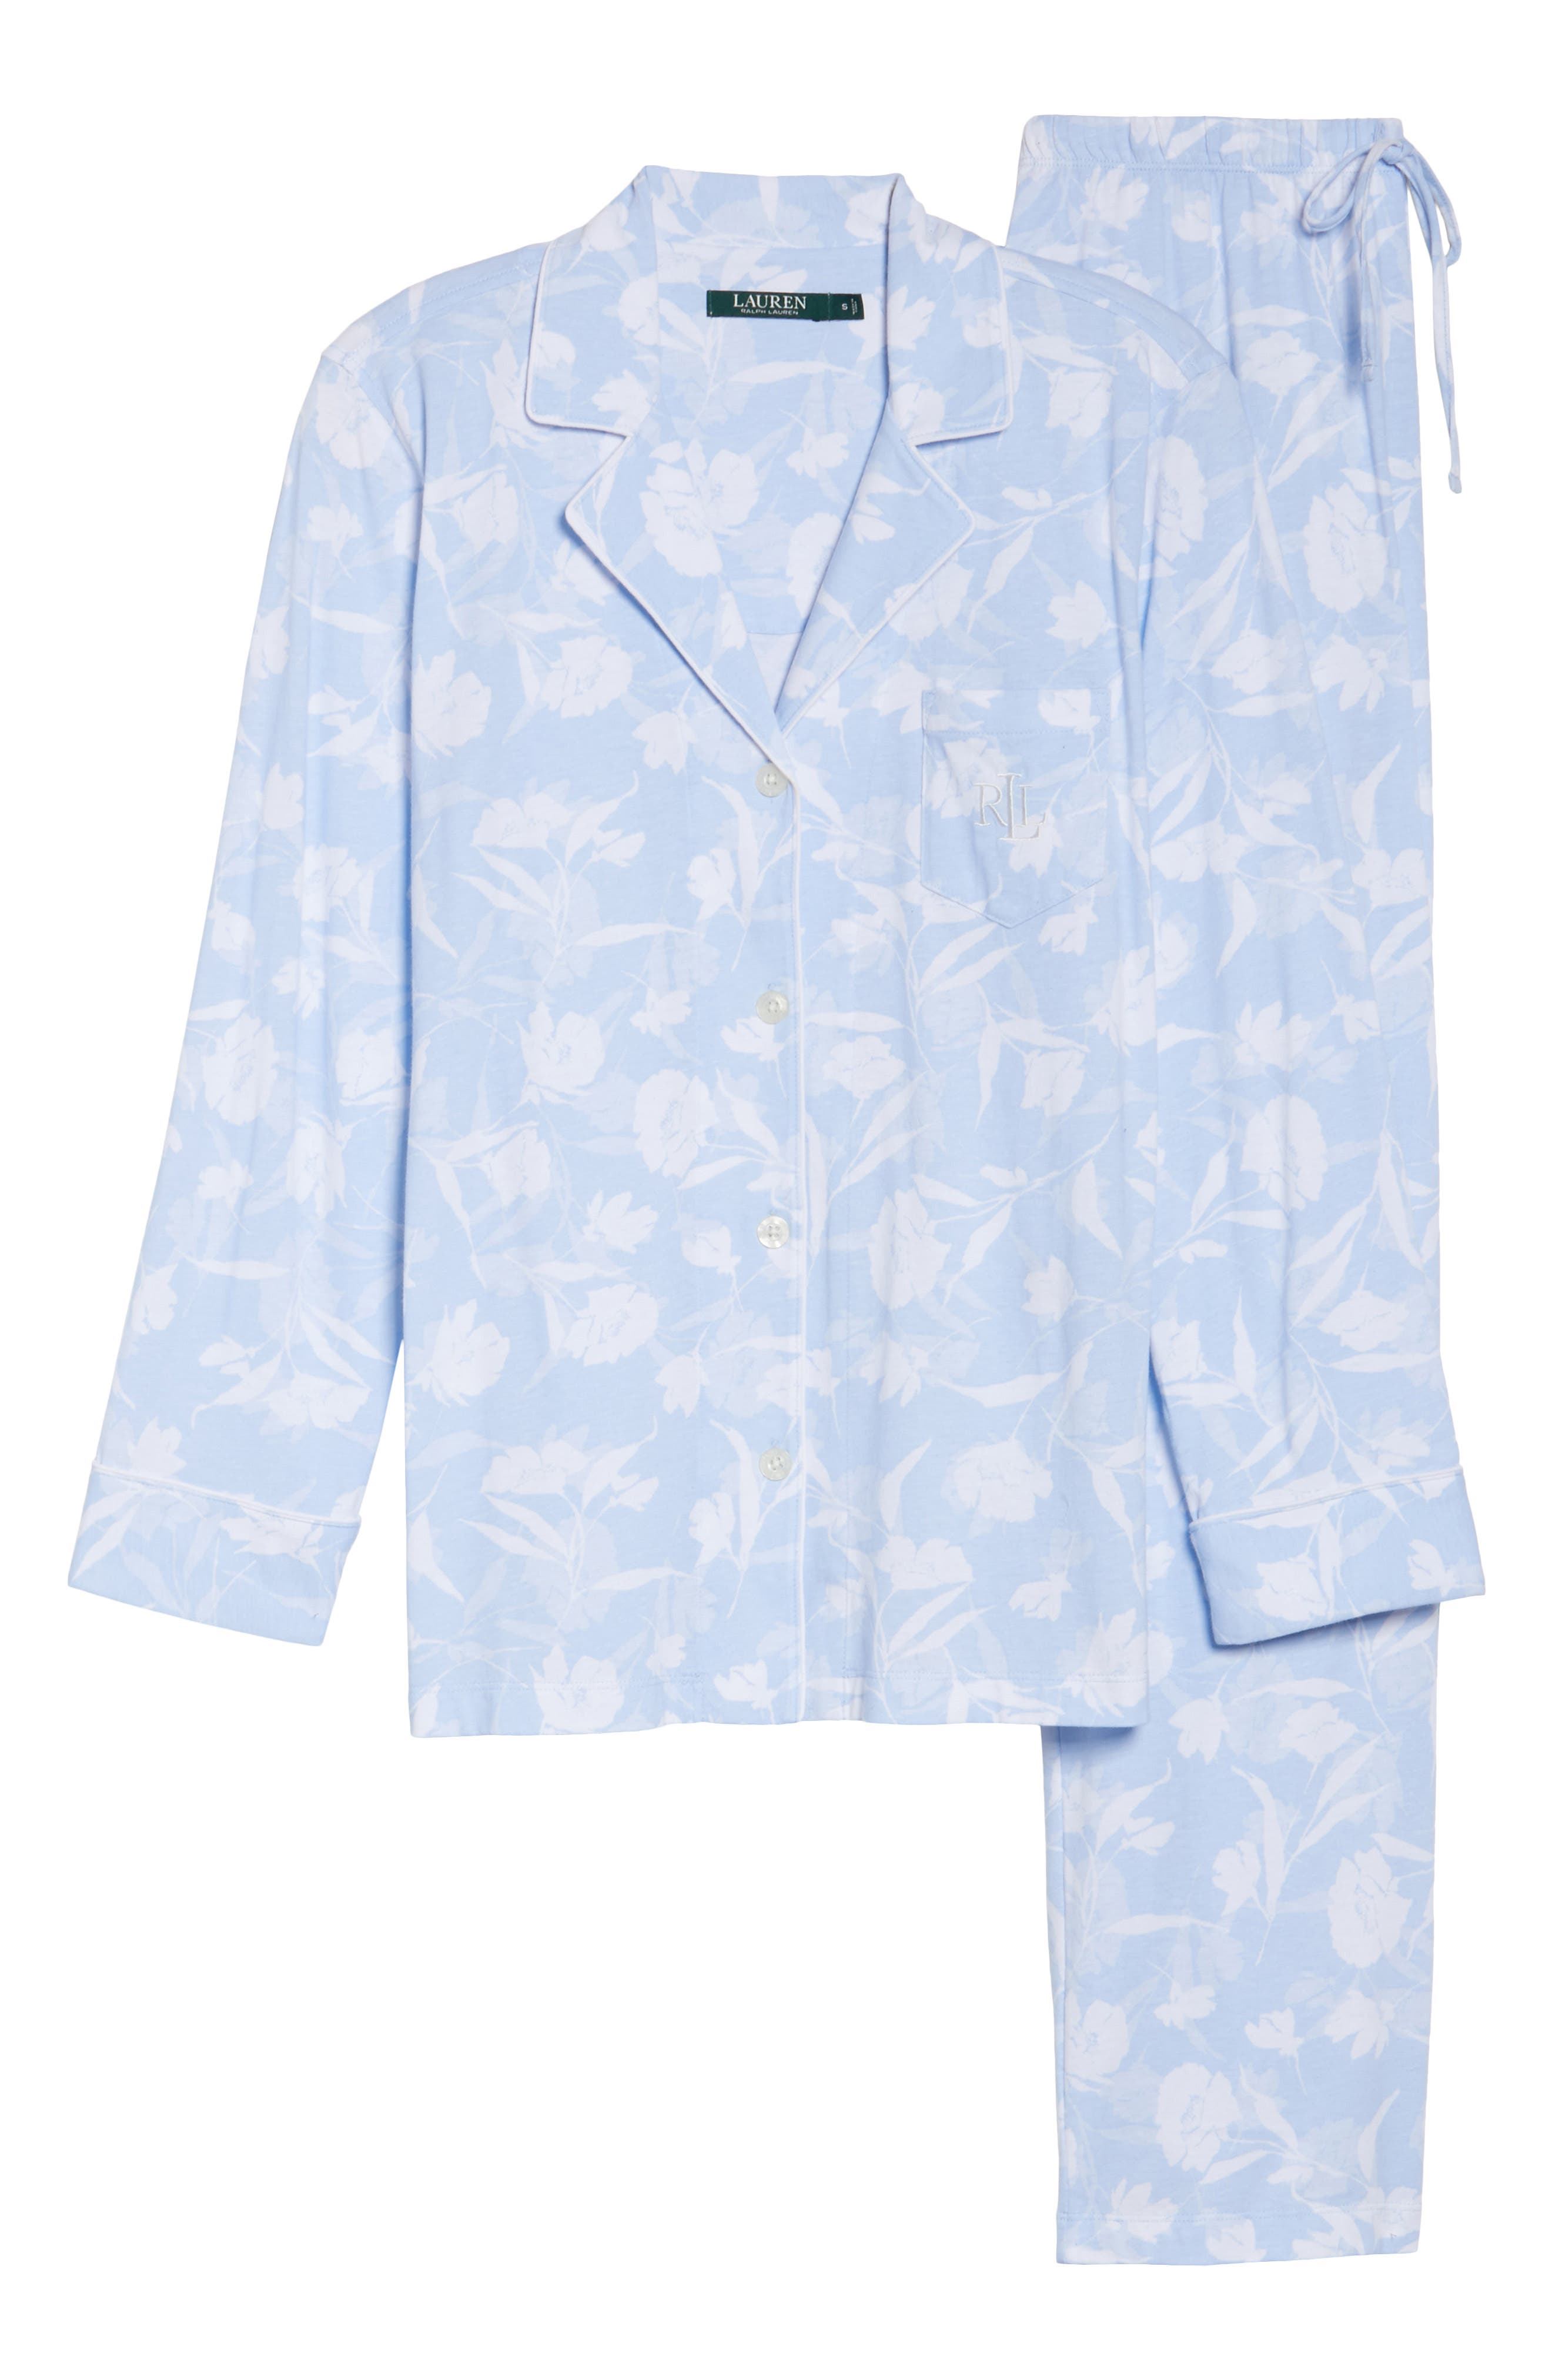 Floral Print Jersey Pajamas,                             Alternate thumbnail 6, color,                             Blue Monotone Floral